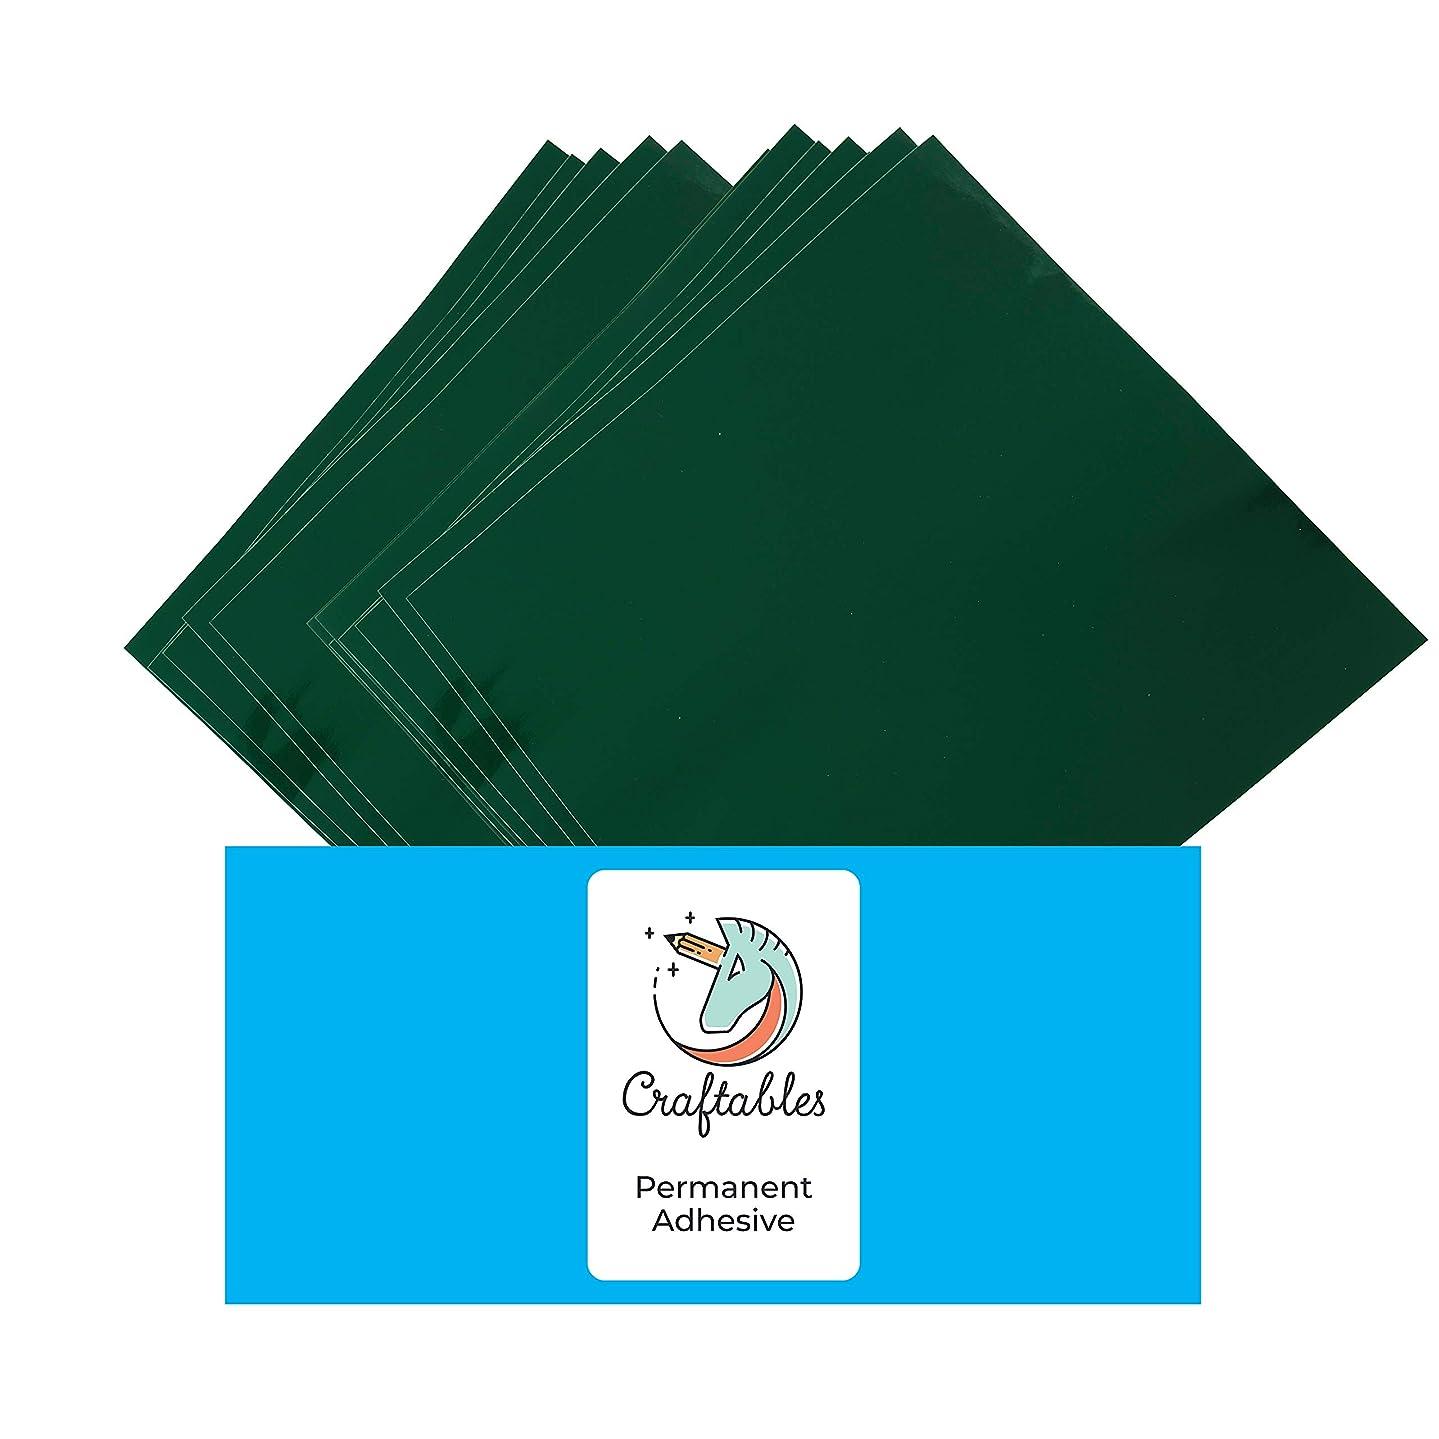 Craftables Dark Green Vinyl Sheets - Permanent, Adhesive, Glossy & Waterproof | (10) 12